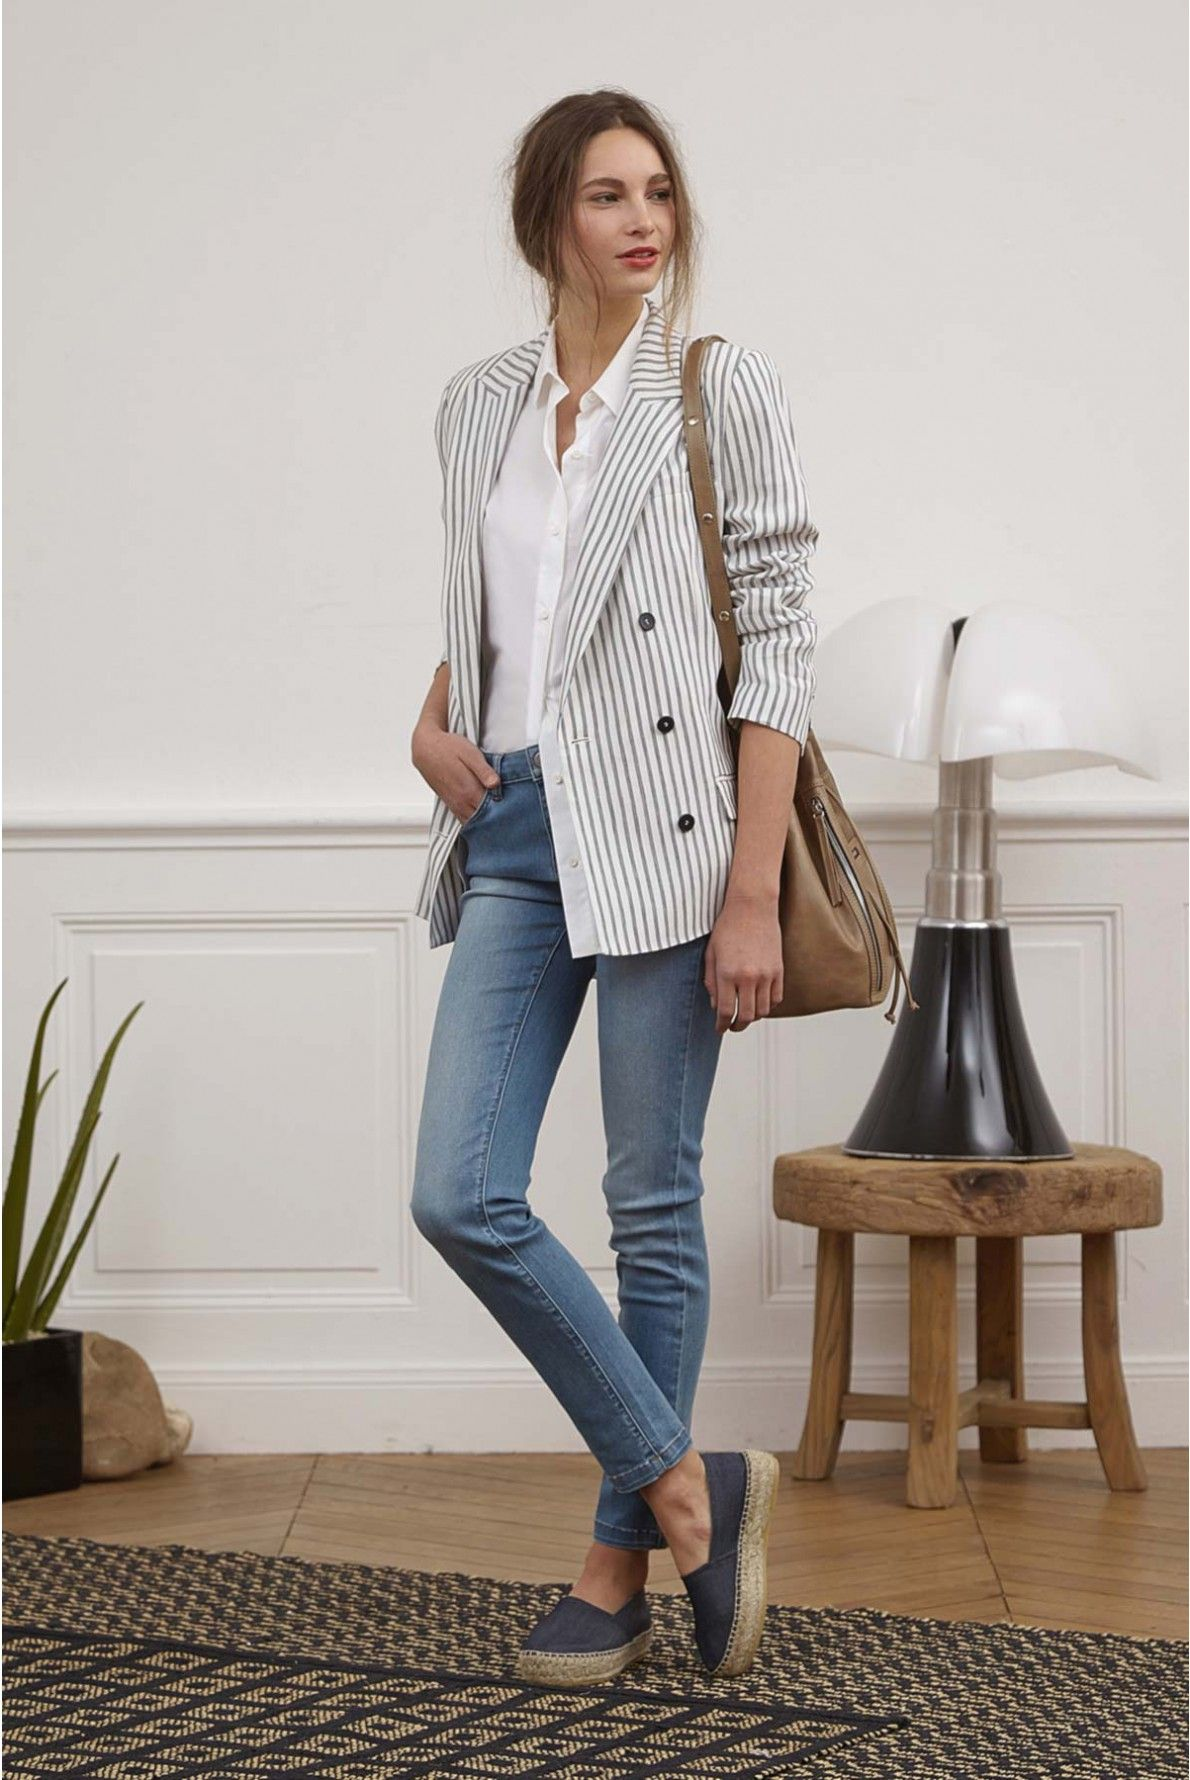 b440a8a33 Sac camel, le seau rebelle | gerard darel | Style | Fashion, Summer ...